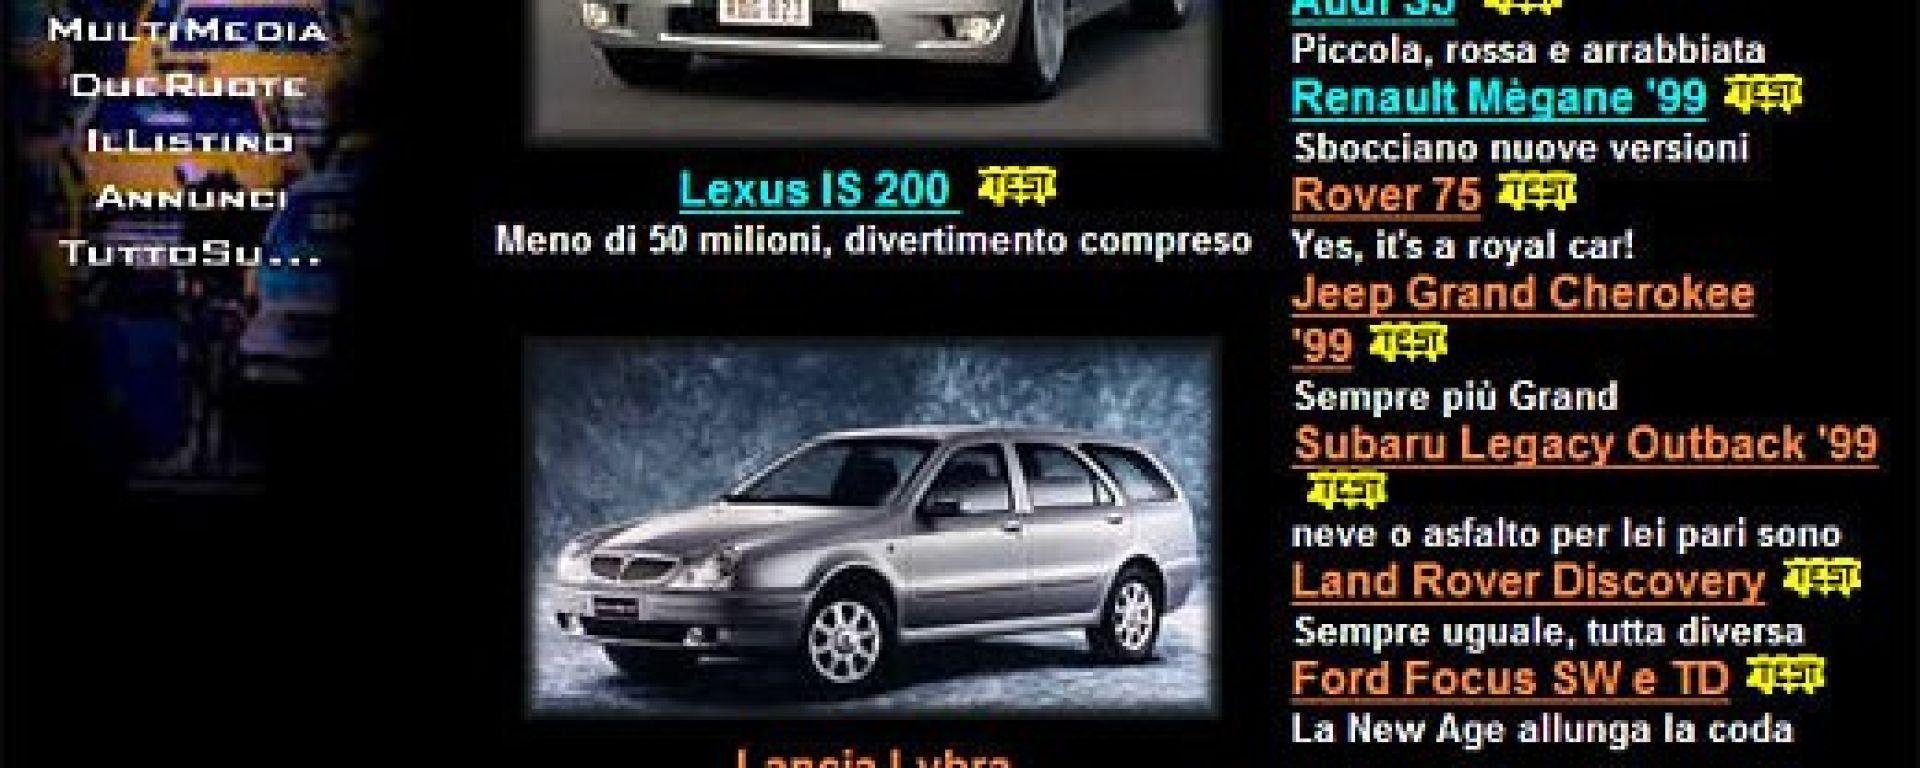 MotorBox model year 2005